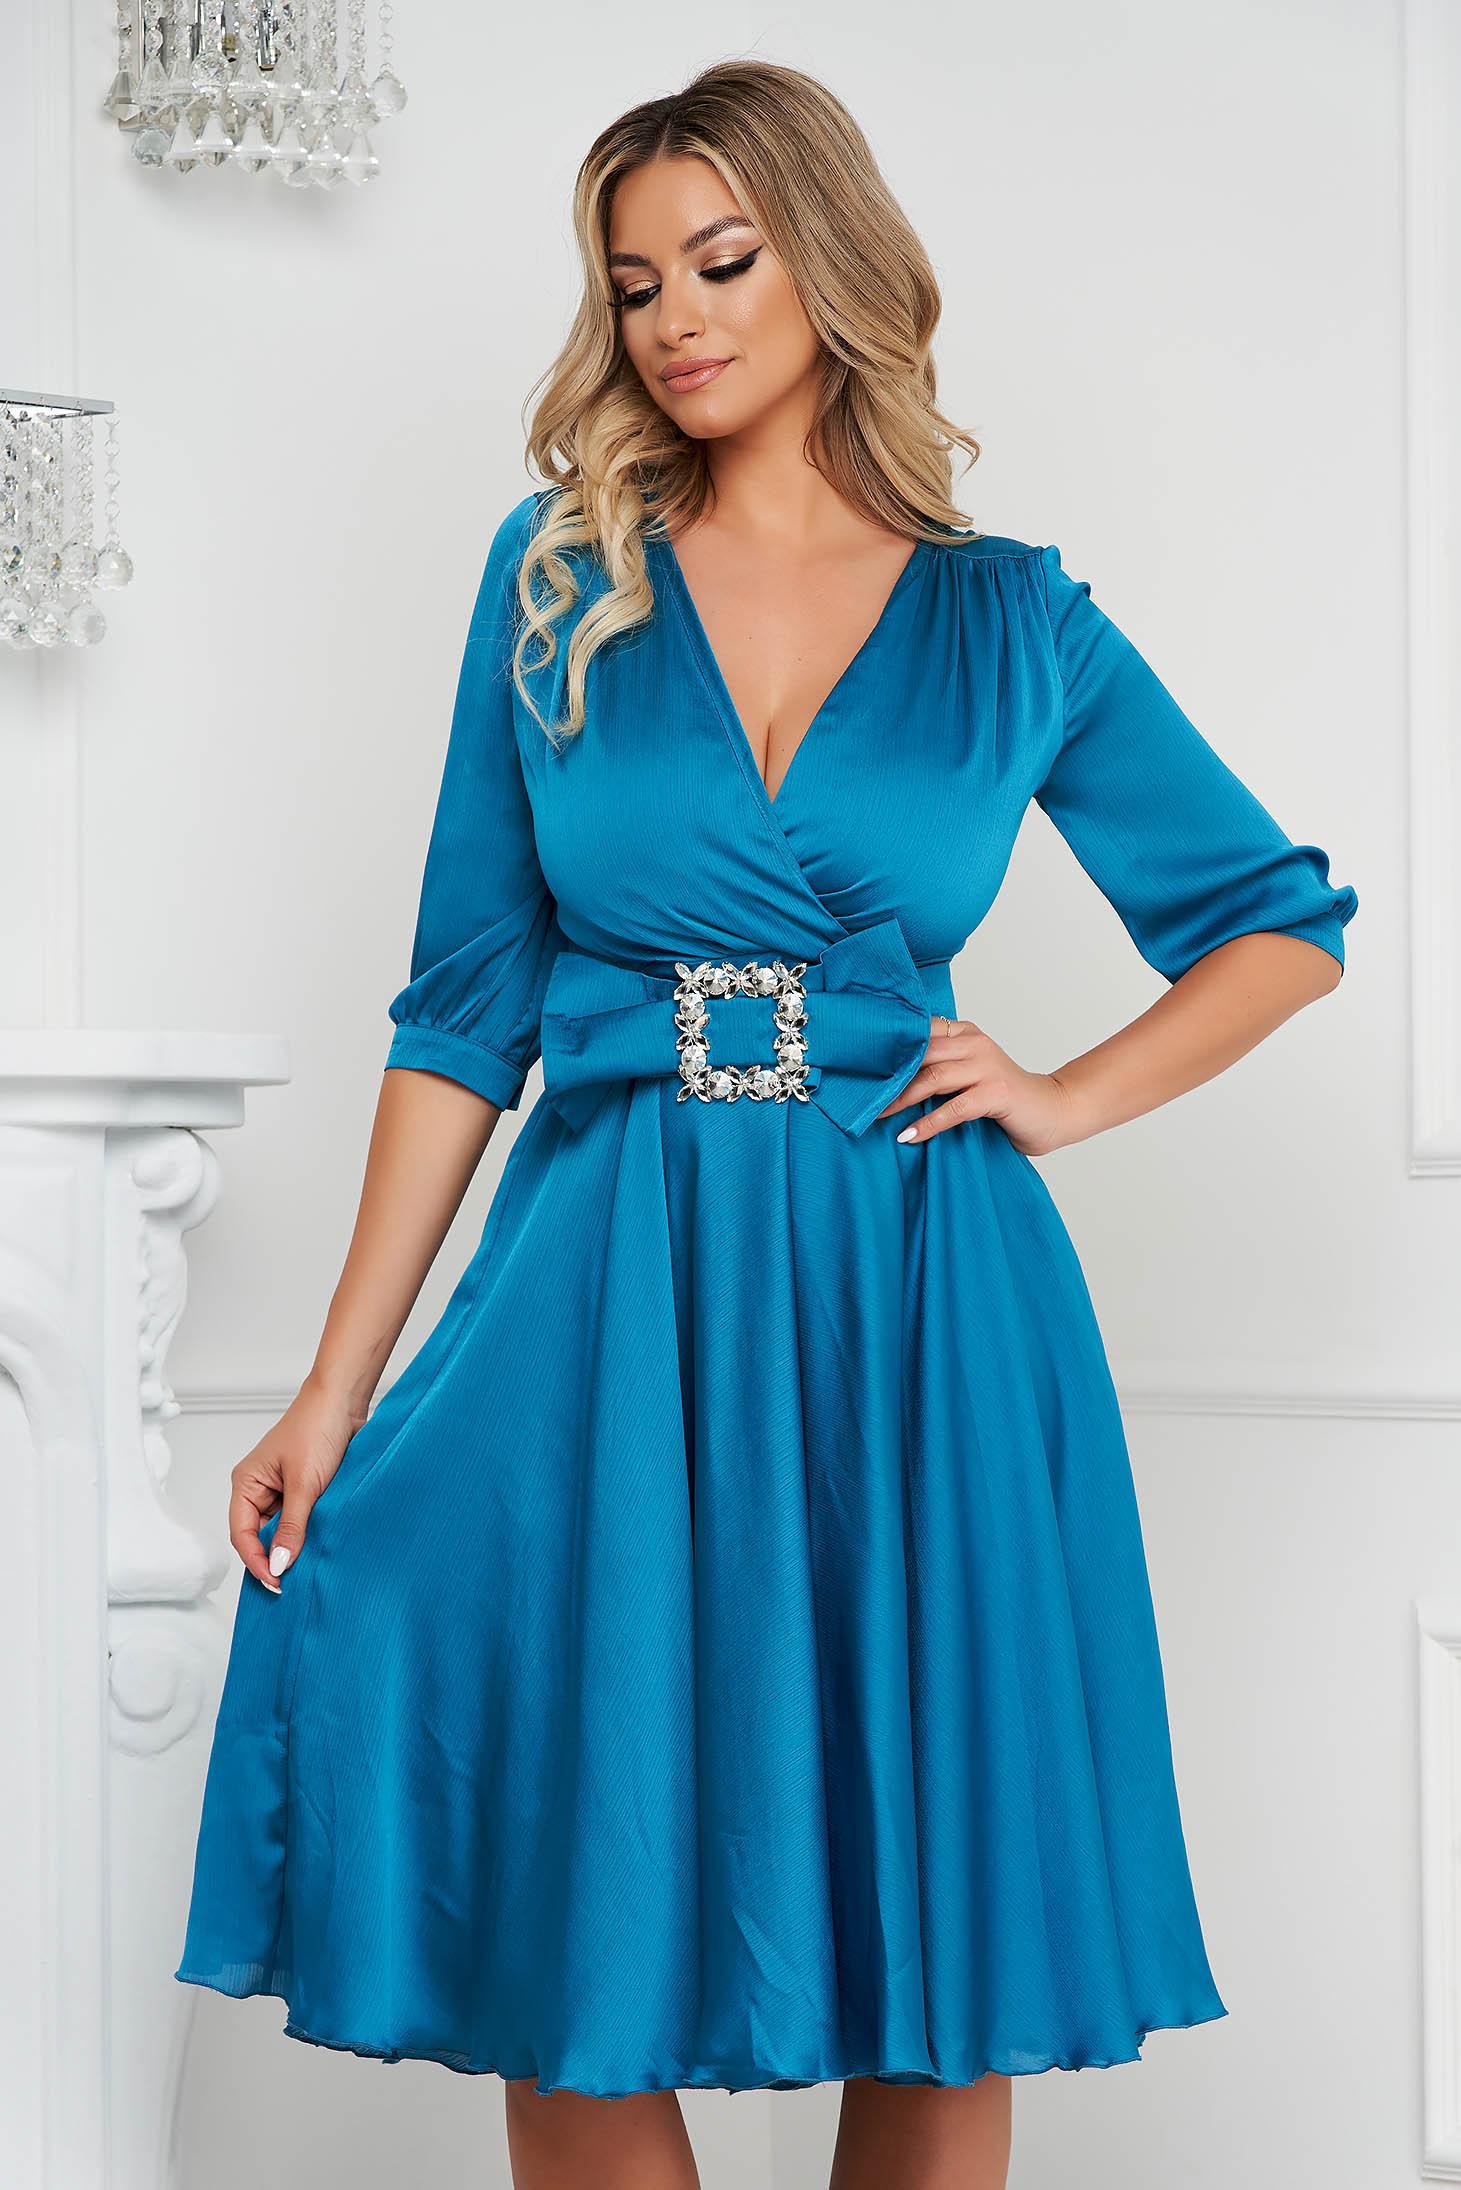 Turquoise dress elegant midi cloche from satin buckle accessory